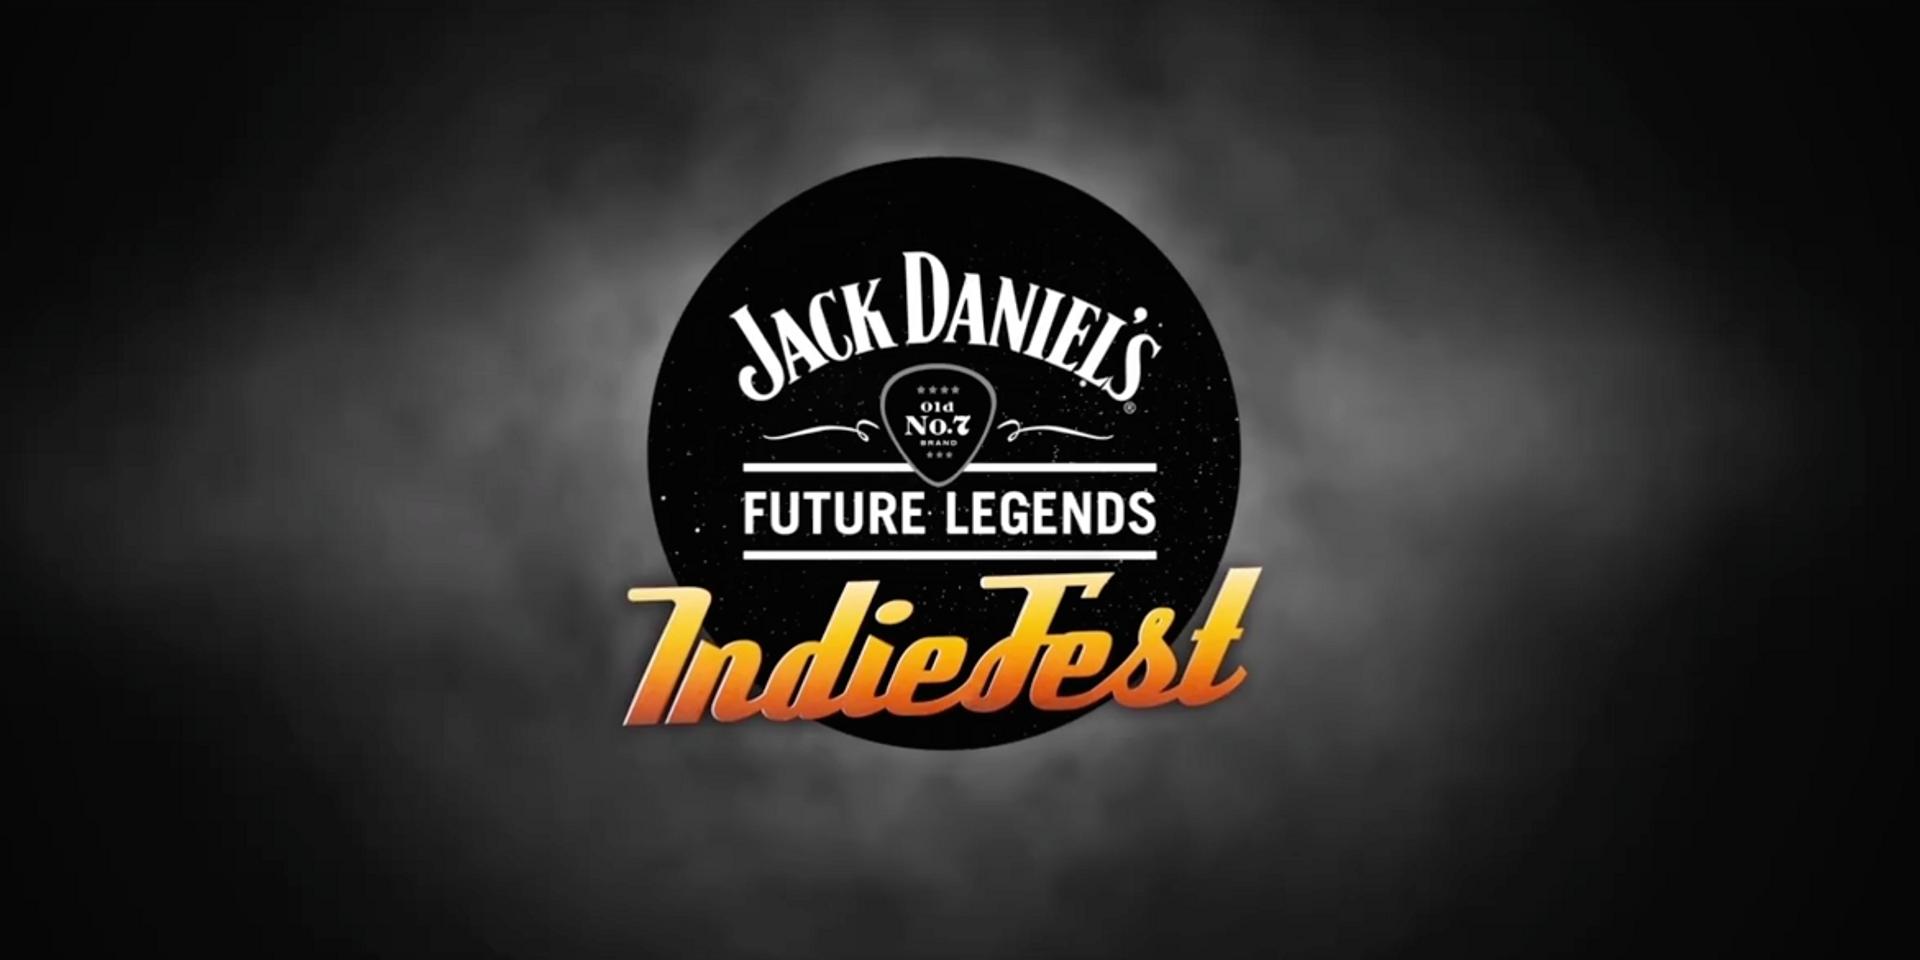 Artist Lineup for Jack Daniel's Future Legends Indiefest 2016 has been released